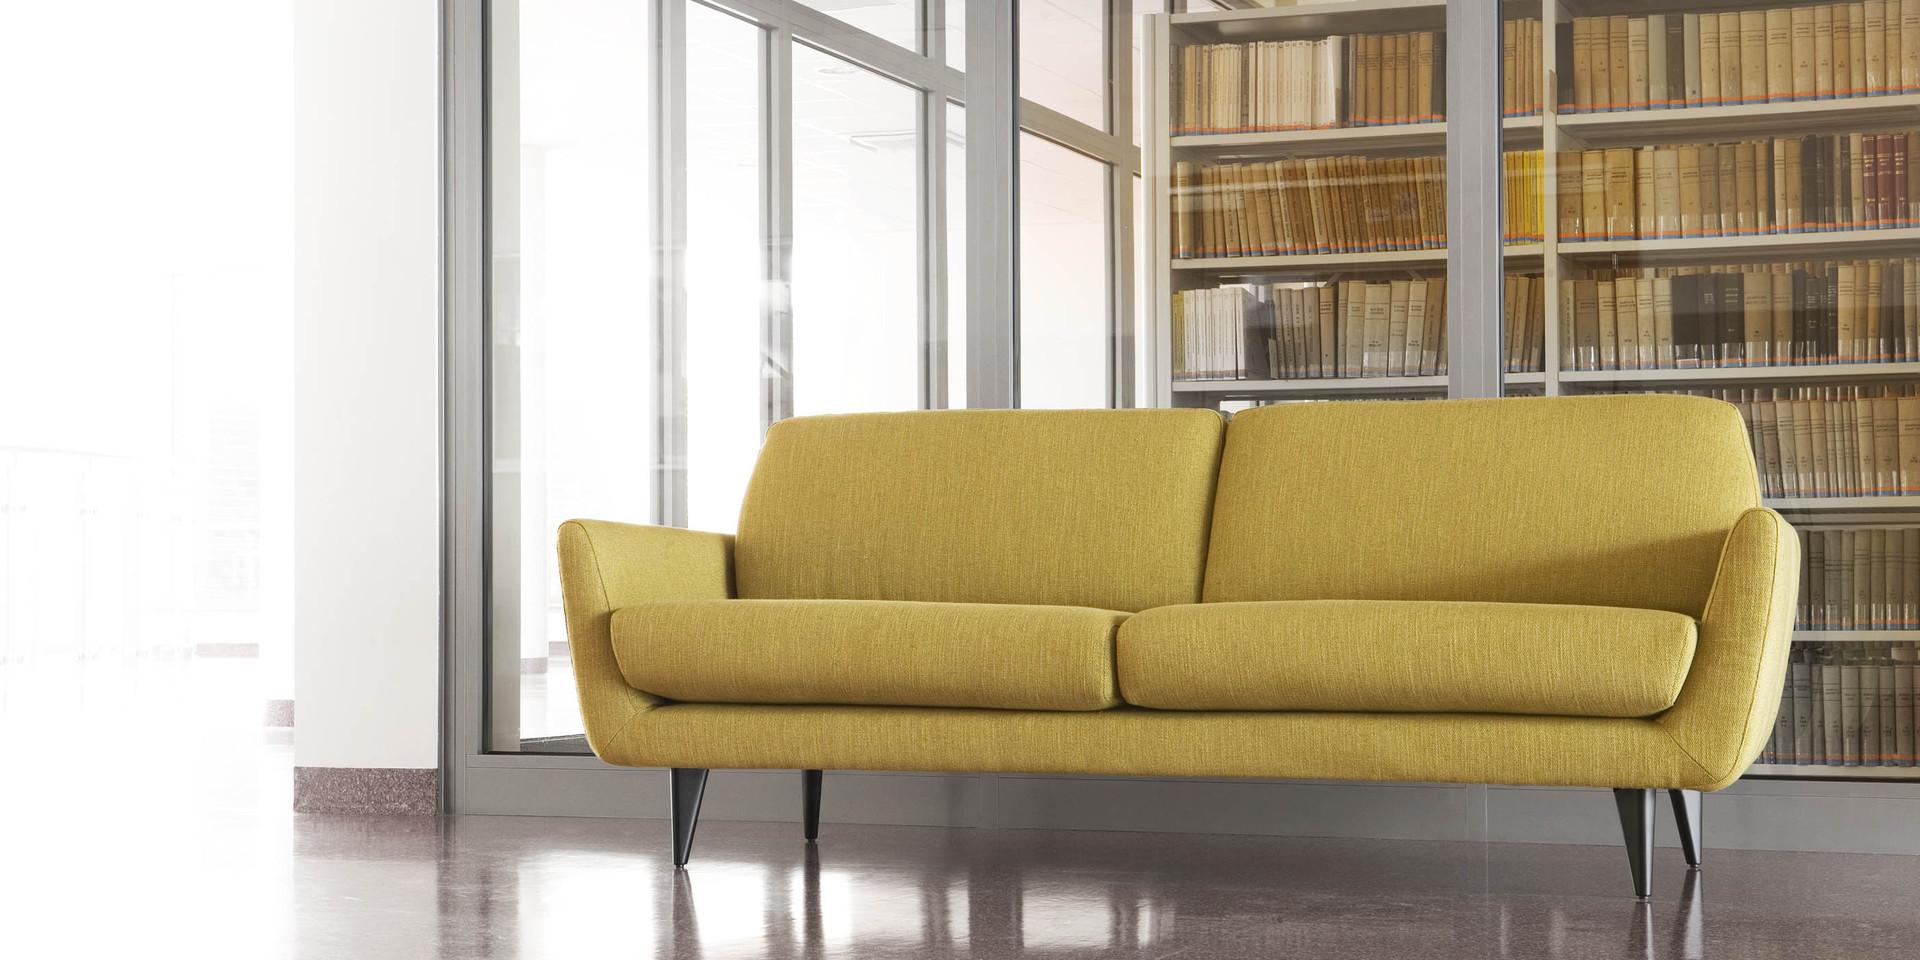 sits-rucola-ambiance-arrangement_3seater_sobral07_olive_3